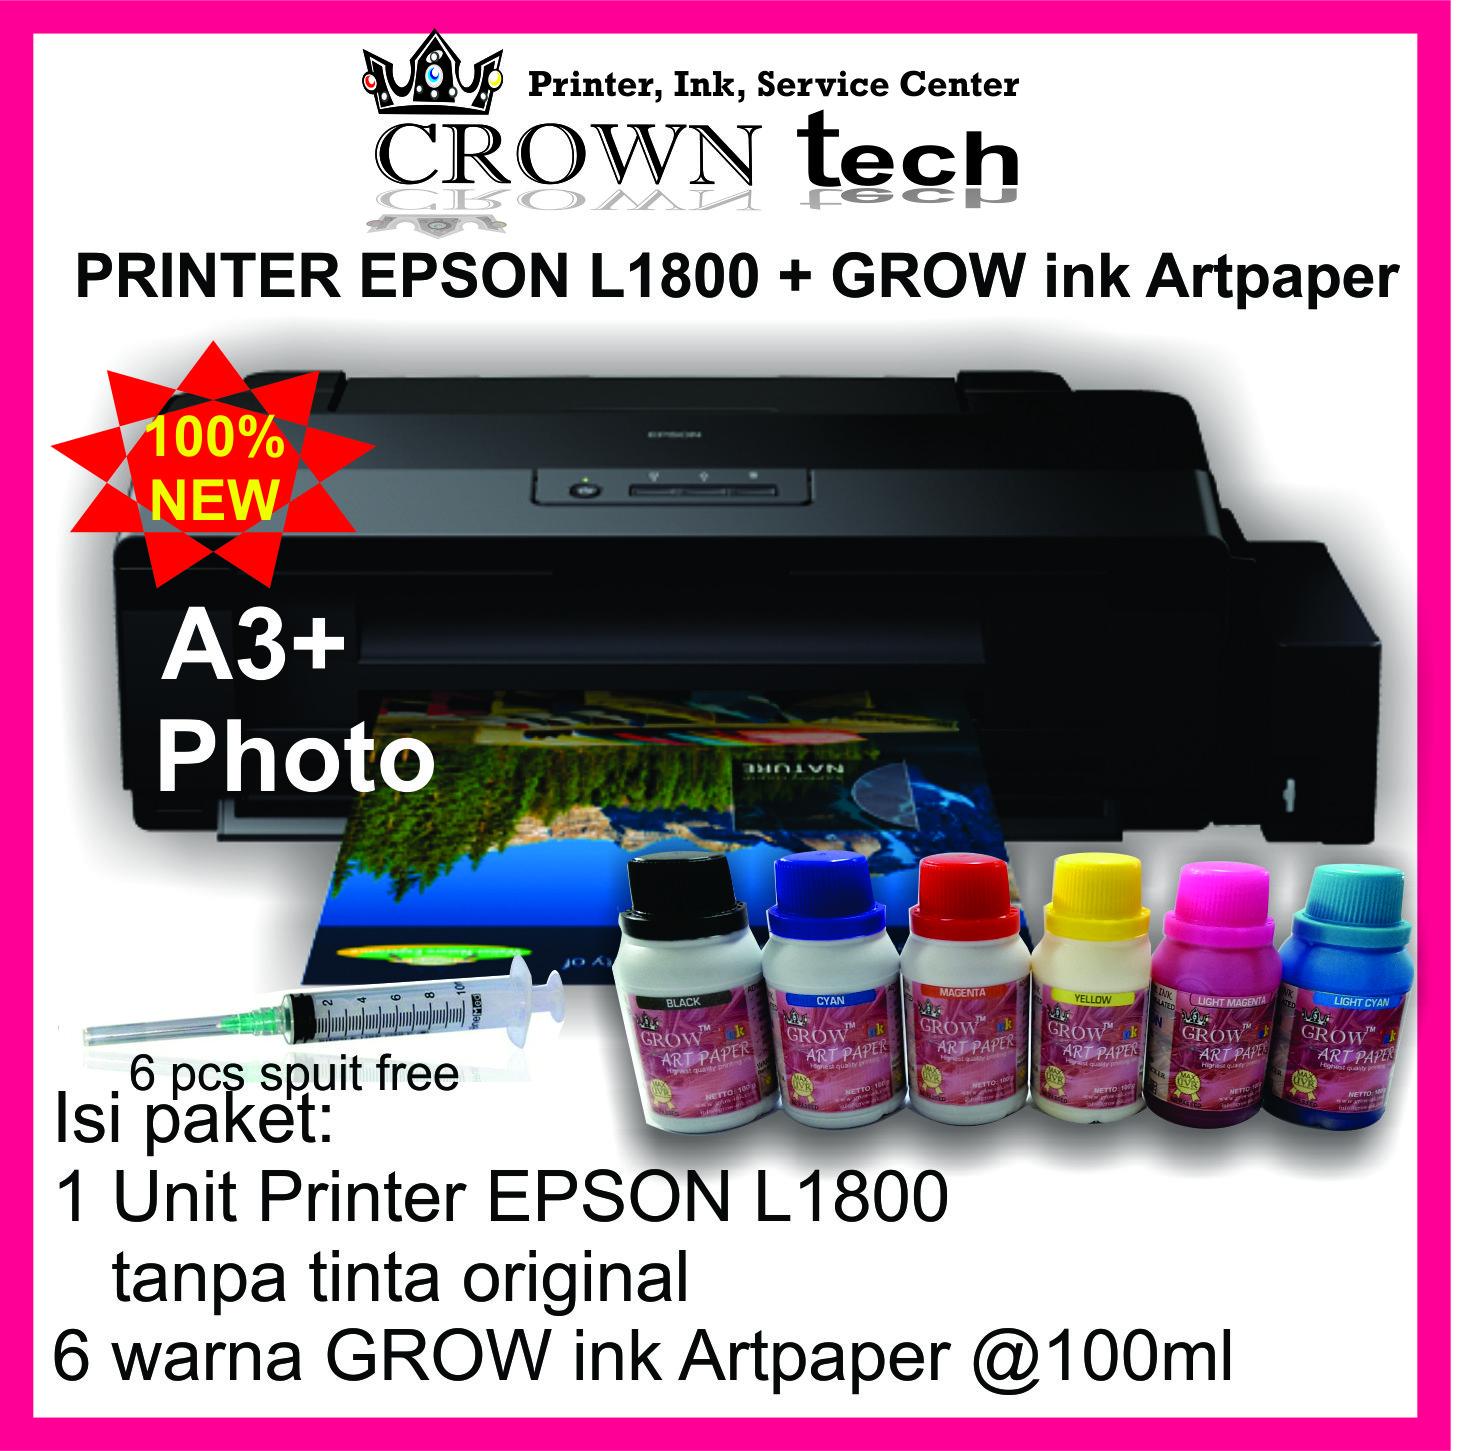 Jual Epson L1800 Printer A3 Photo Grow Ink Art Paper Crown Tech Tokopedia